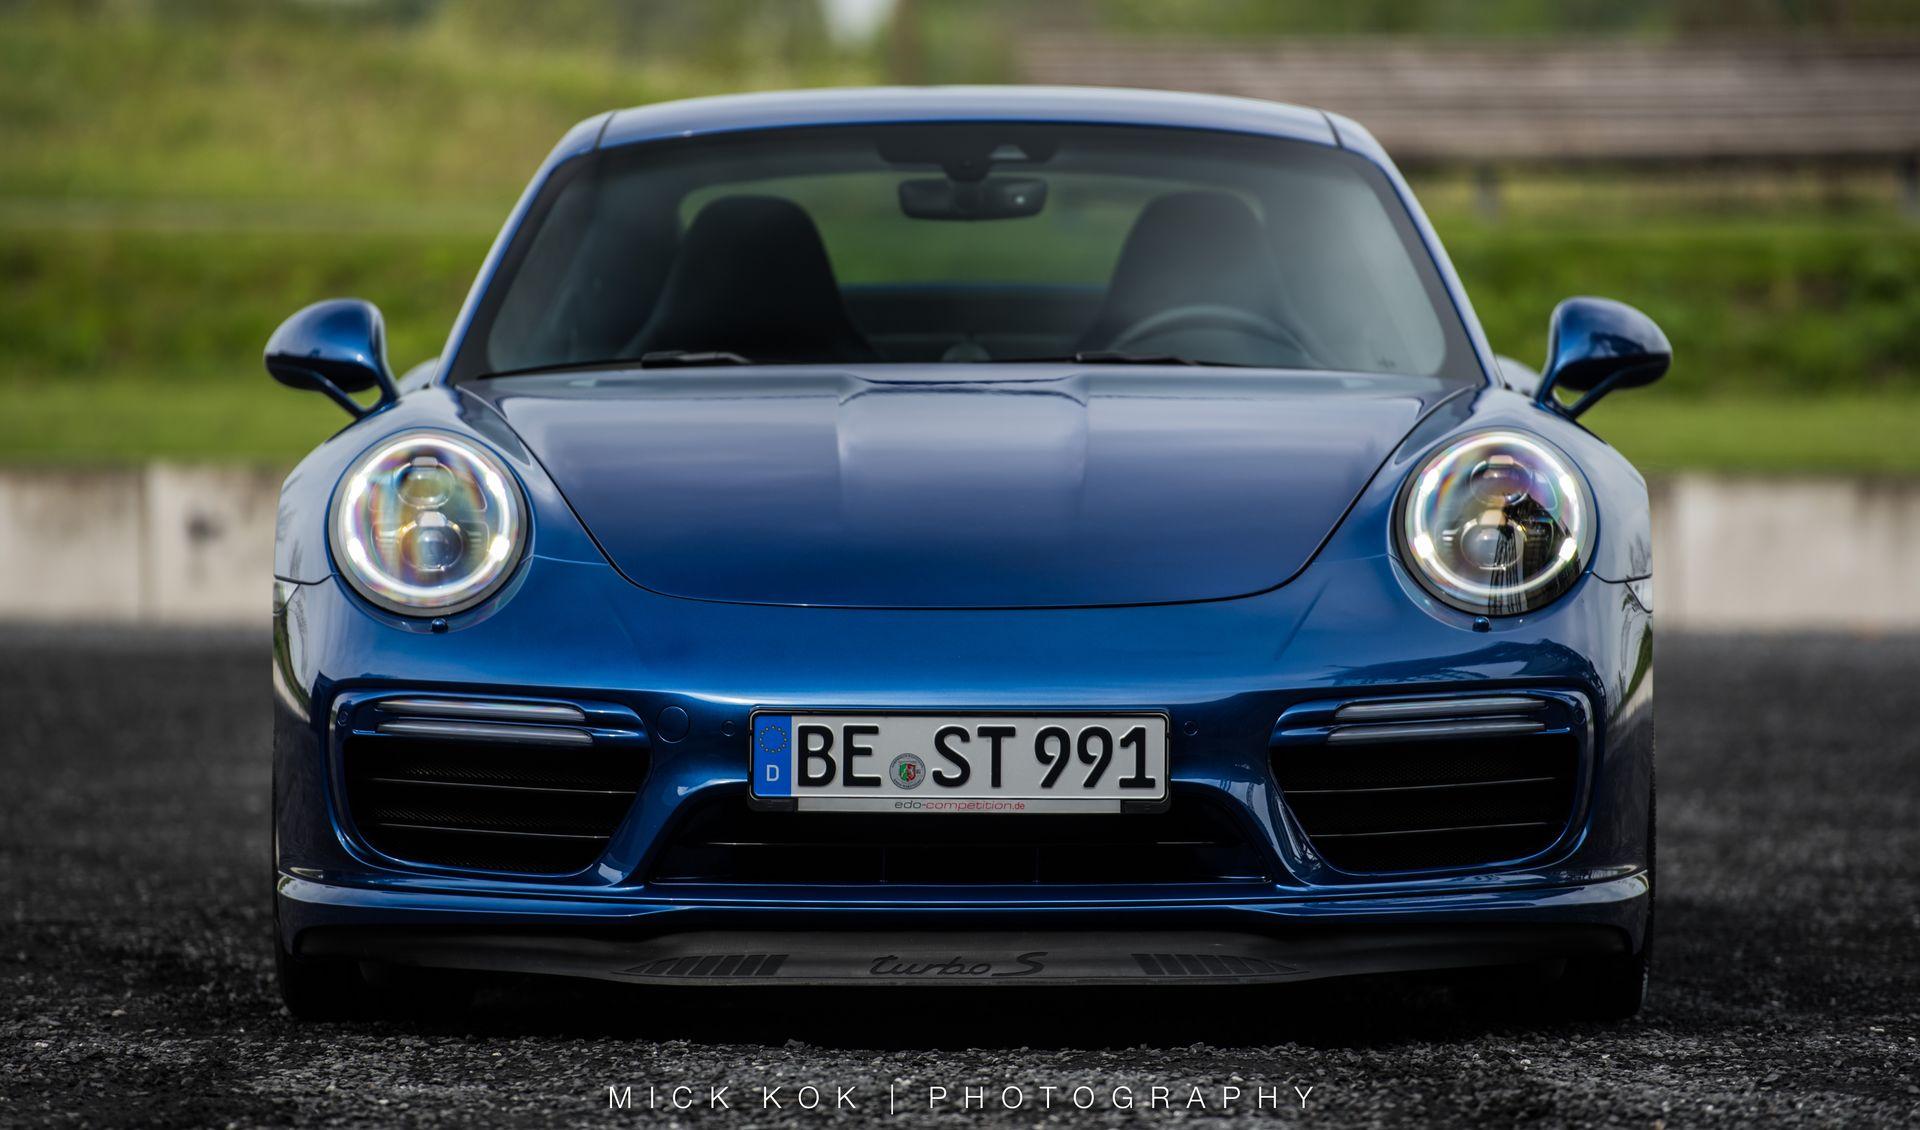 Porsche 911 Turbo S Edo Competition